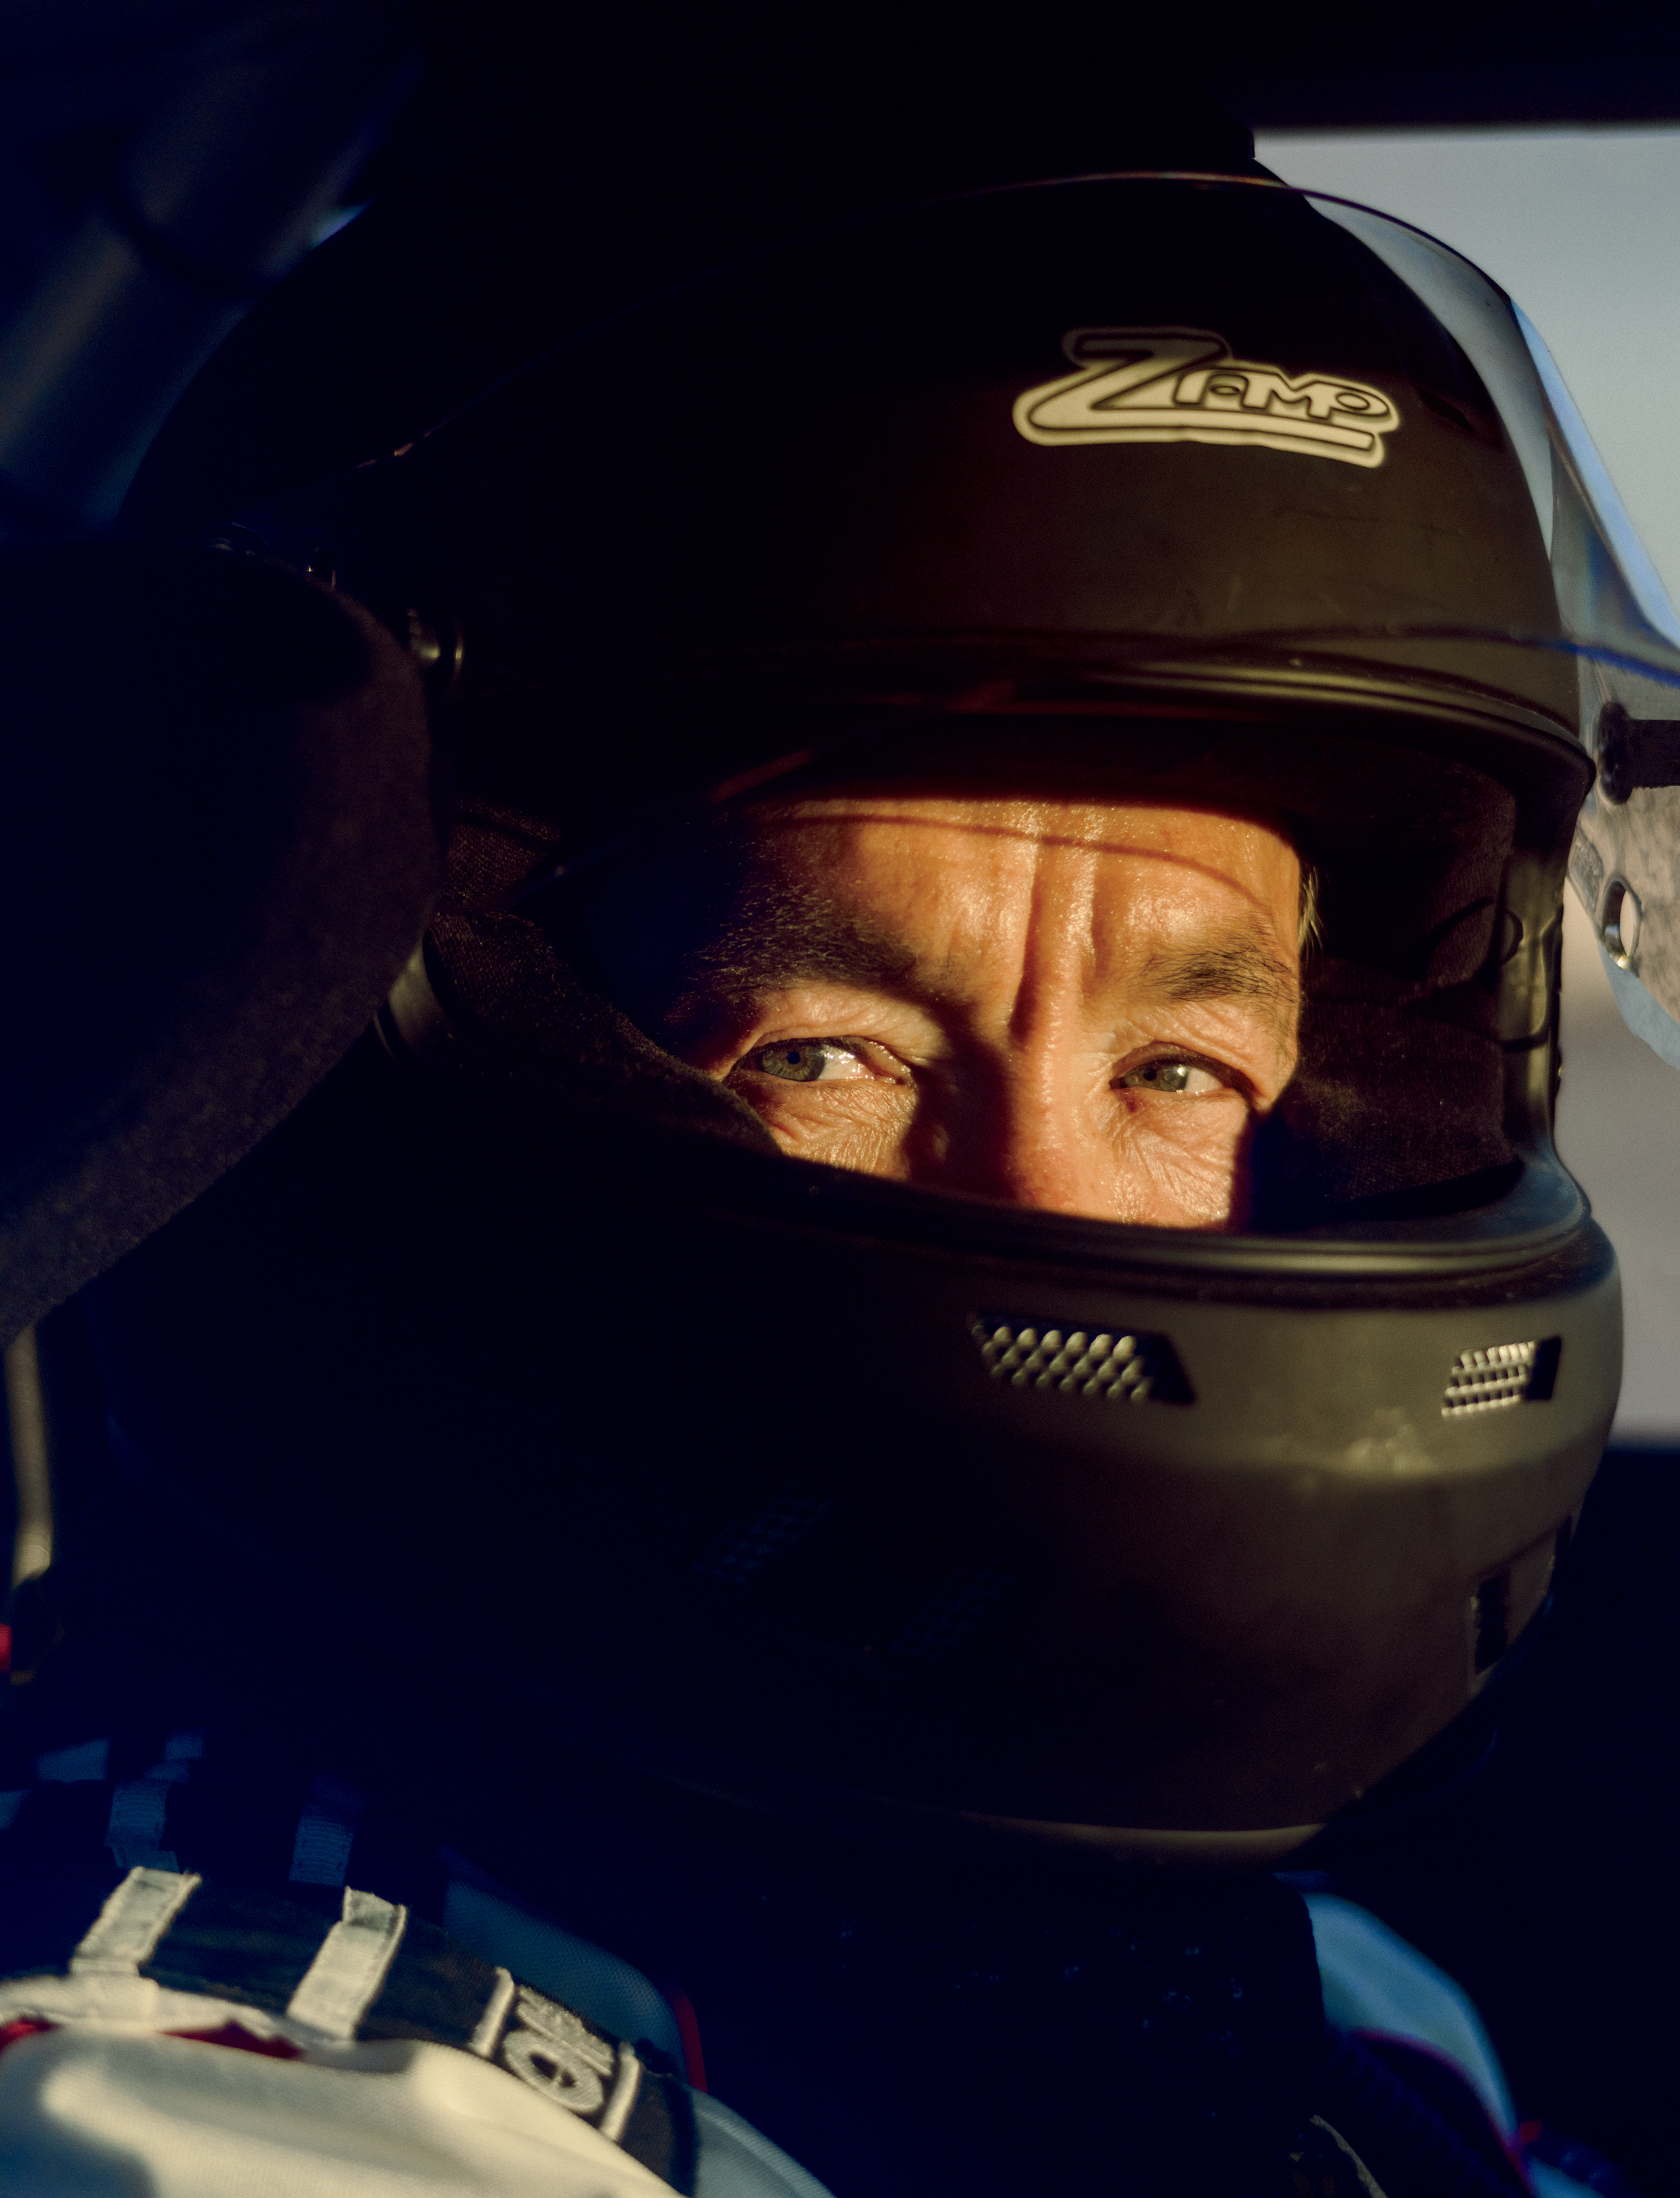 Randy Lanier Florida Pot Smuggling Kingpin Indy Car Driver